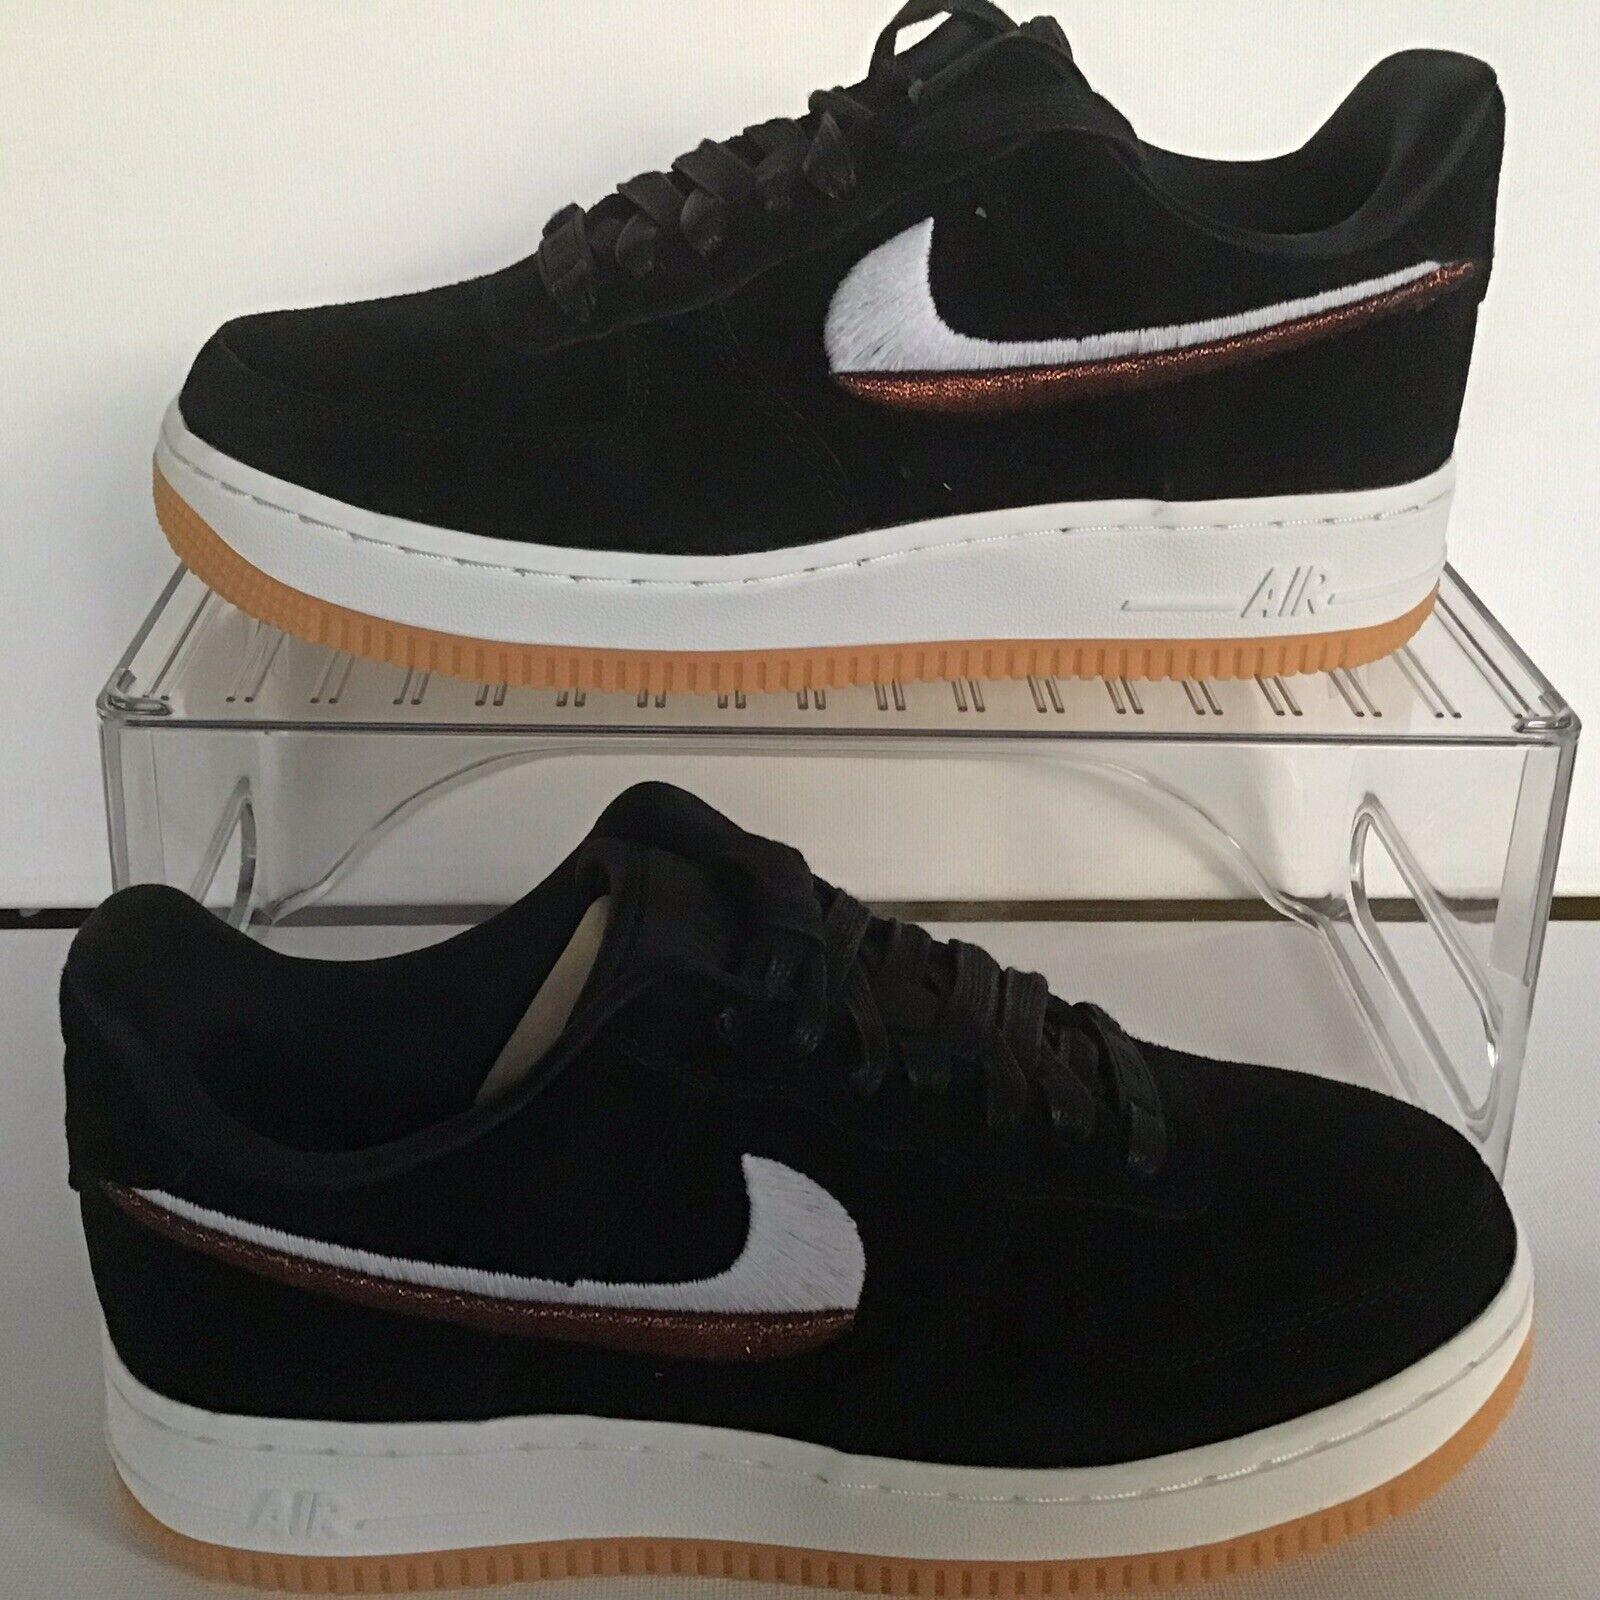 Wmns Nike Air Force 1 '07 LX Black Black-Gum Yellow Wmns.Size 5.5 (898889 010)